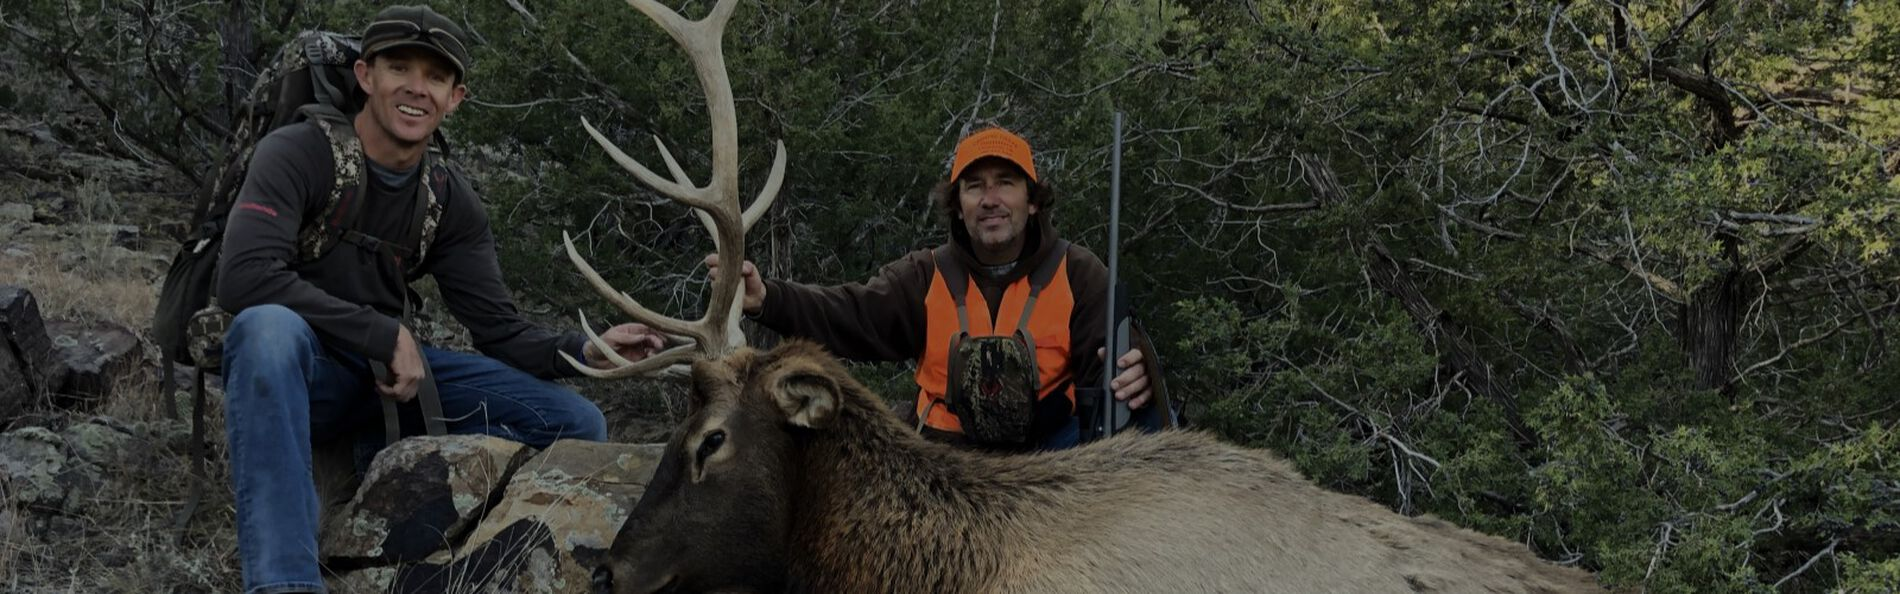 Two hunters kneeling by a downed elk